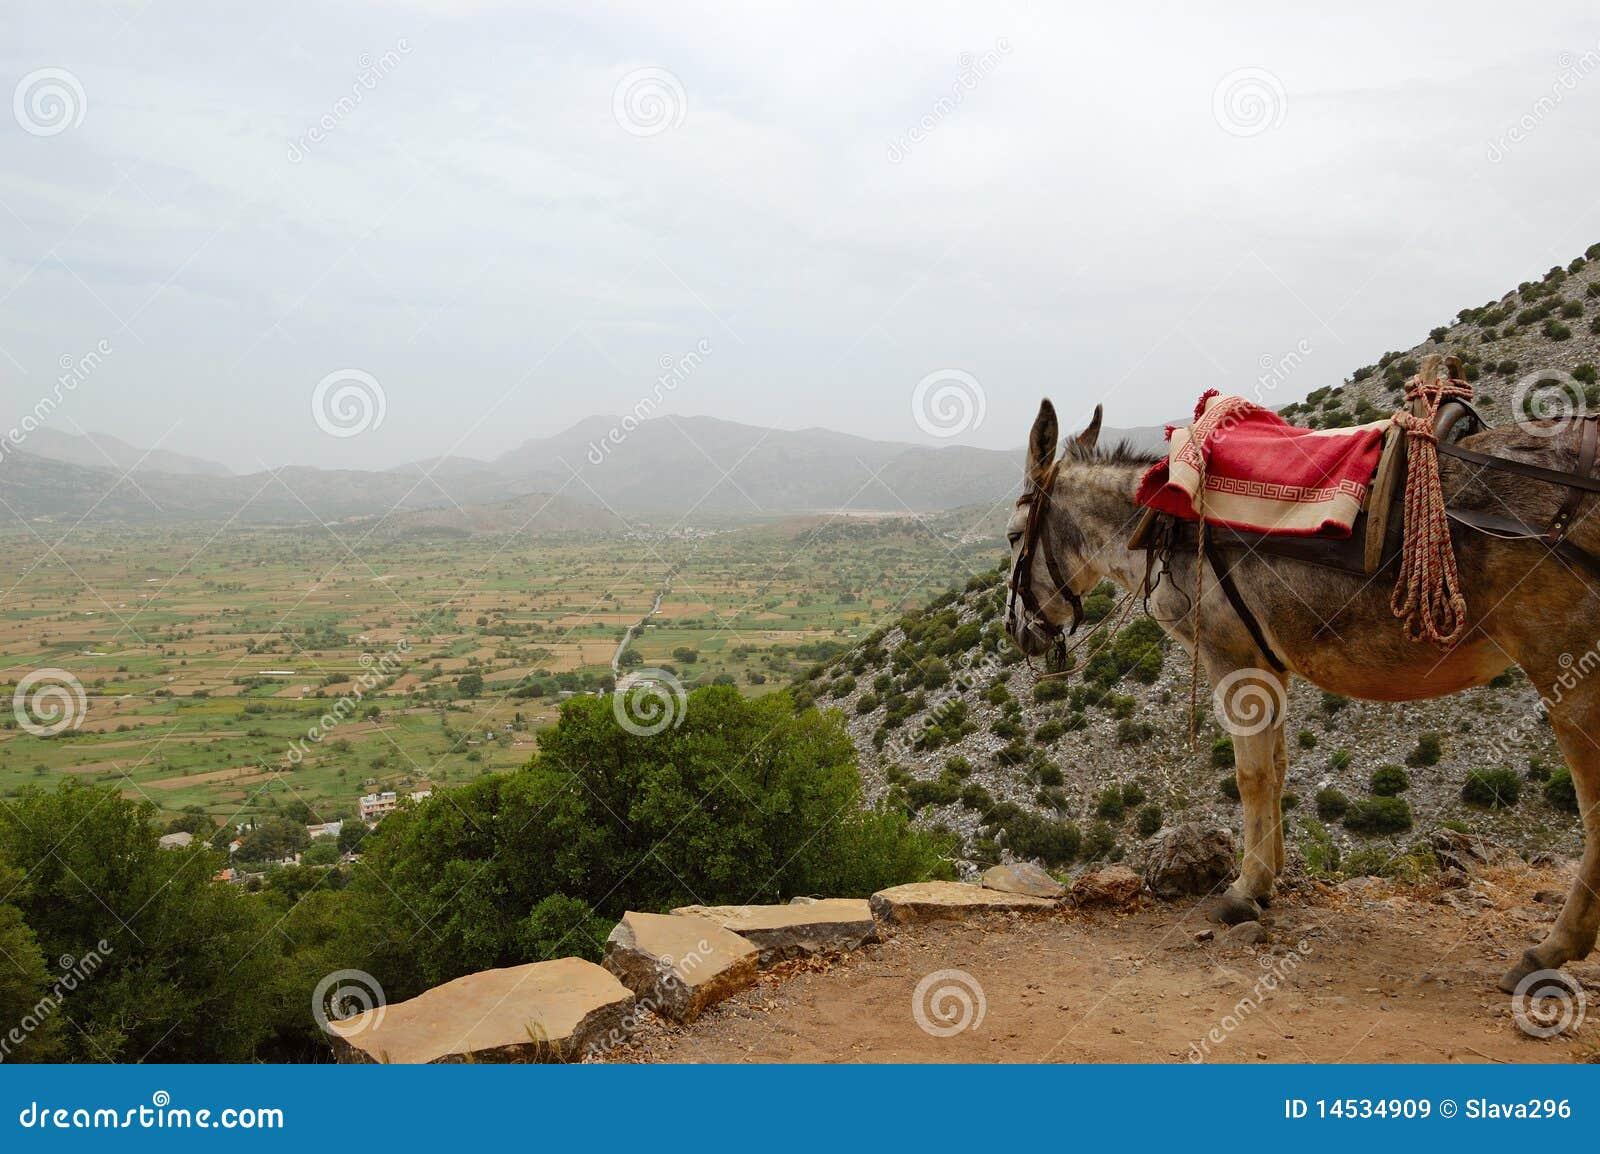 Donkey and Lassithi Plateau view